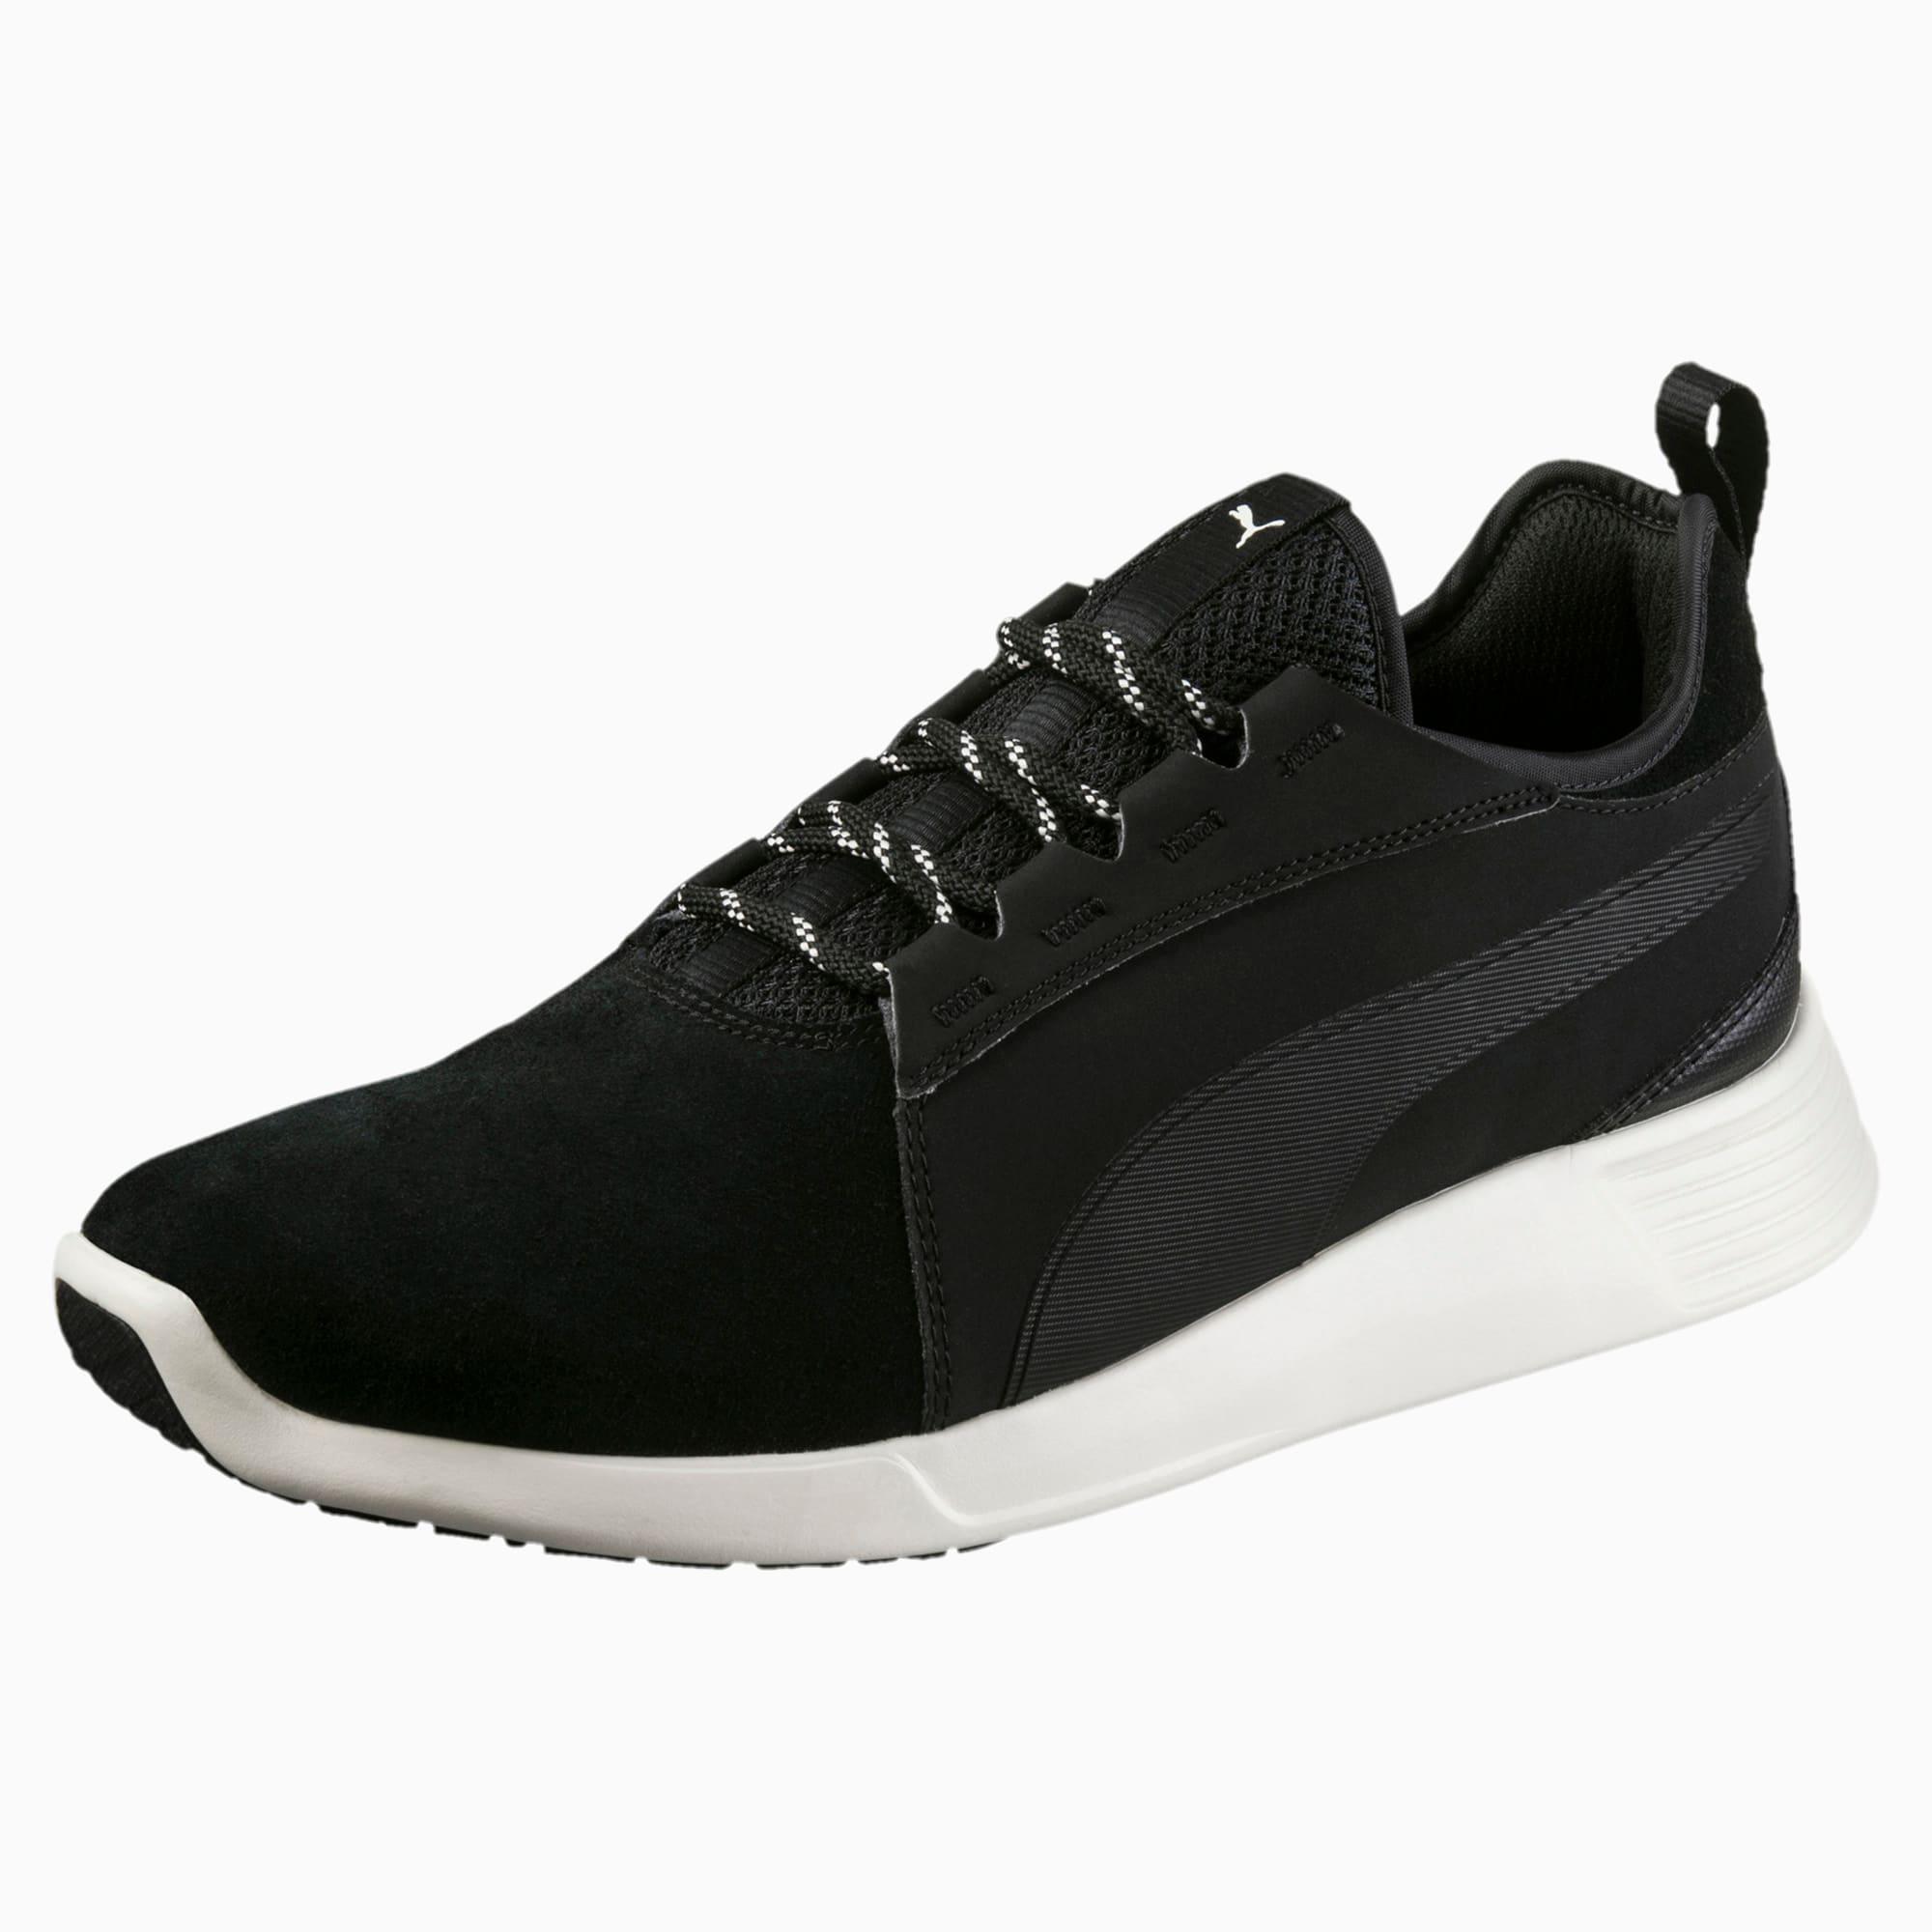 ST Trainer Evo v2 Suede Trainers | PUMA Shoes | PUMA Germany